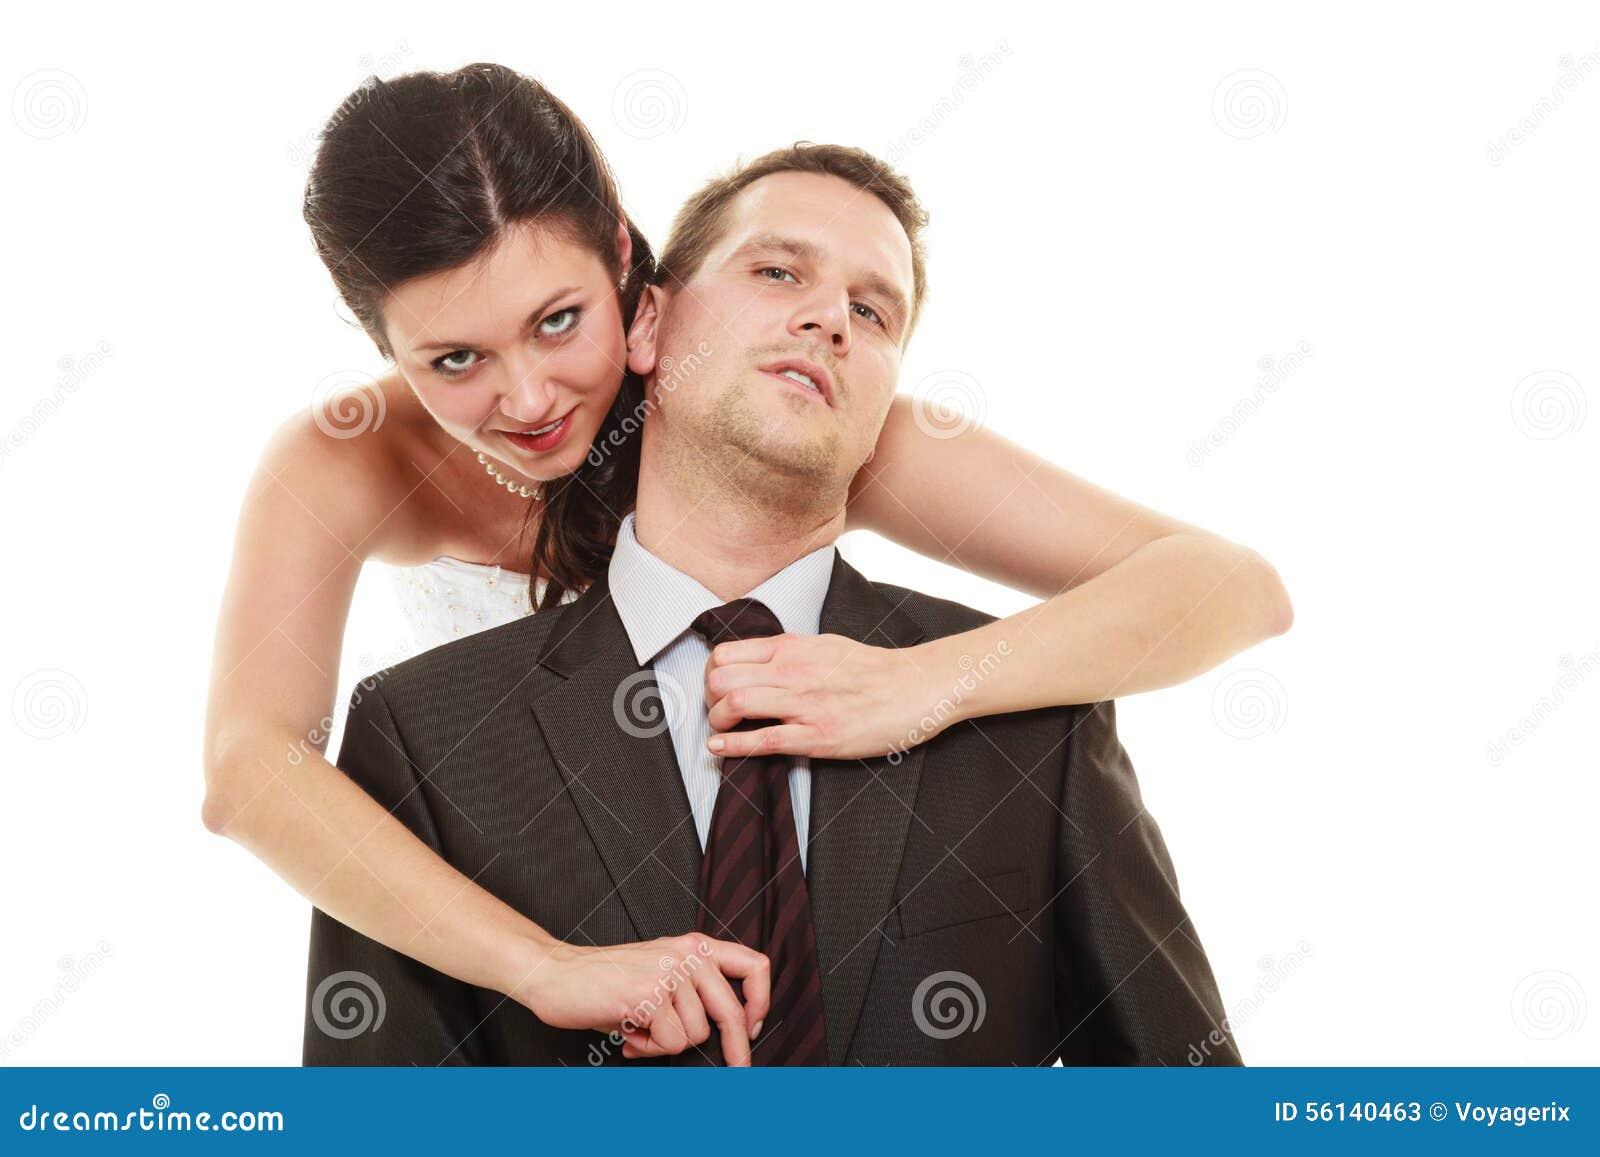 wife female domination